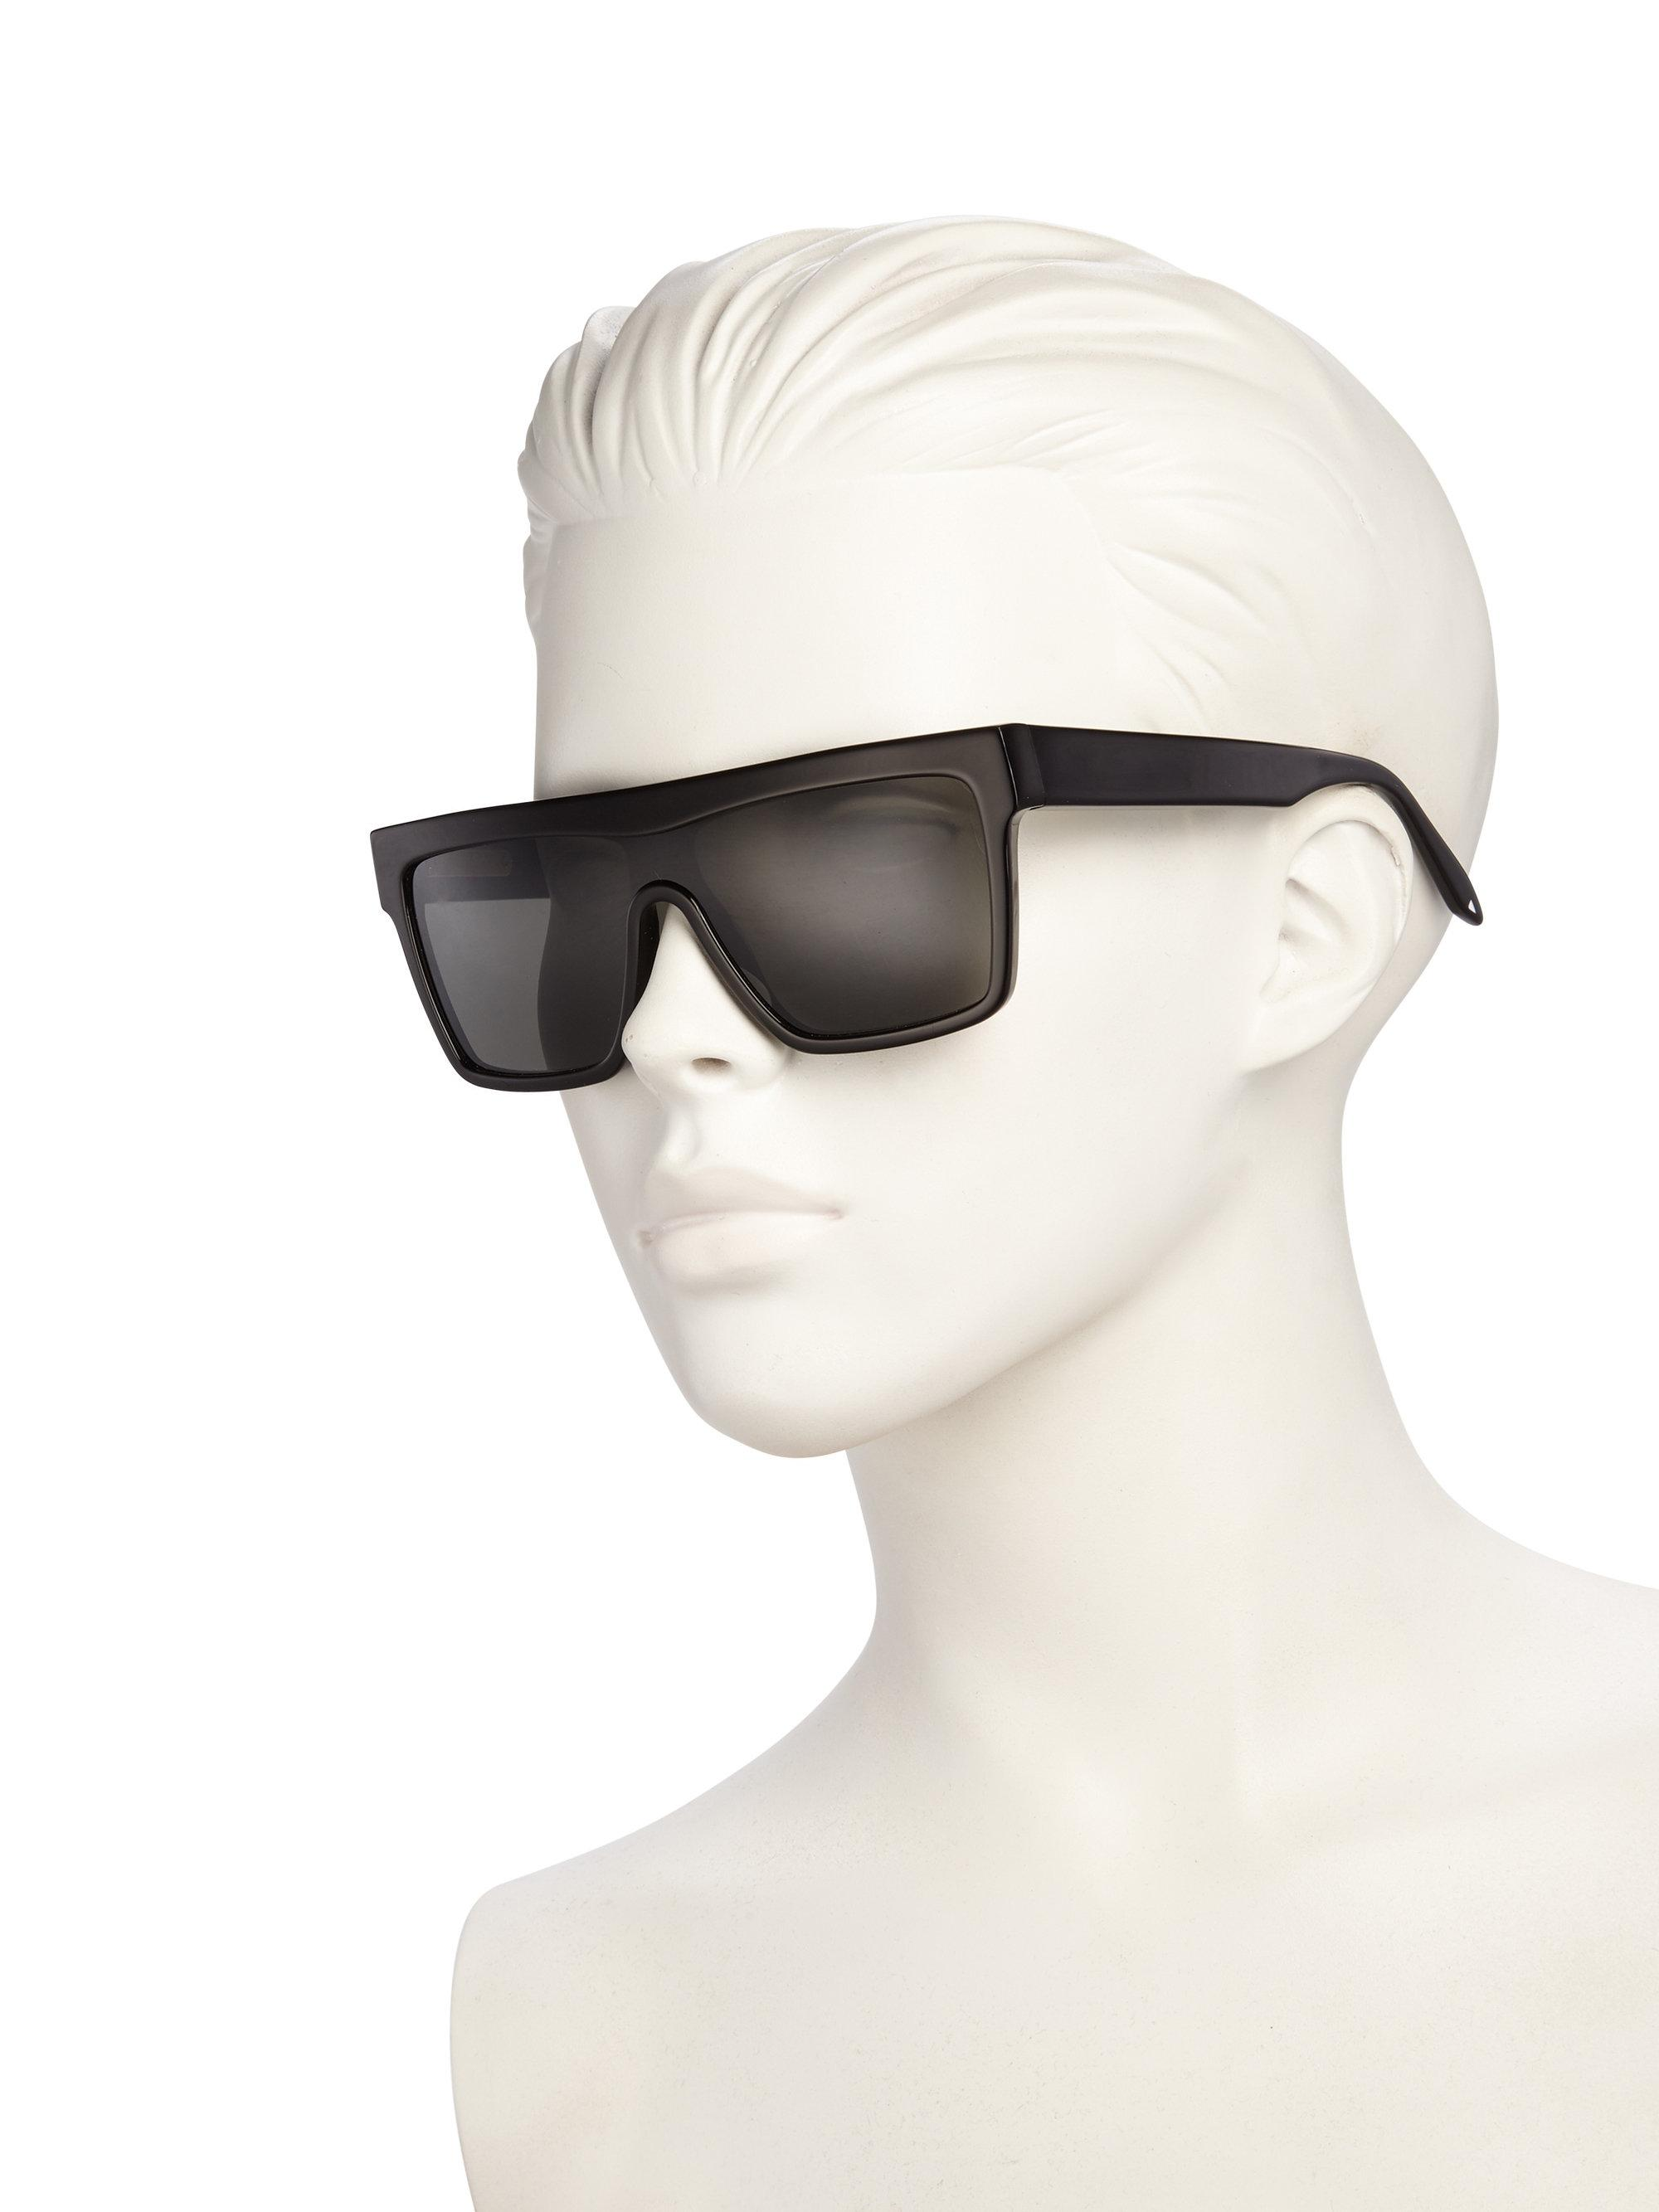 Victoria Beckham 57mm Flat Top Visor Sunglasses In Black